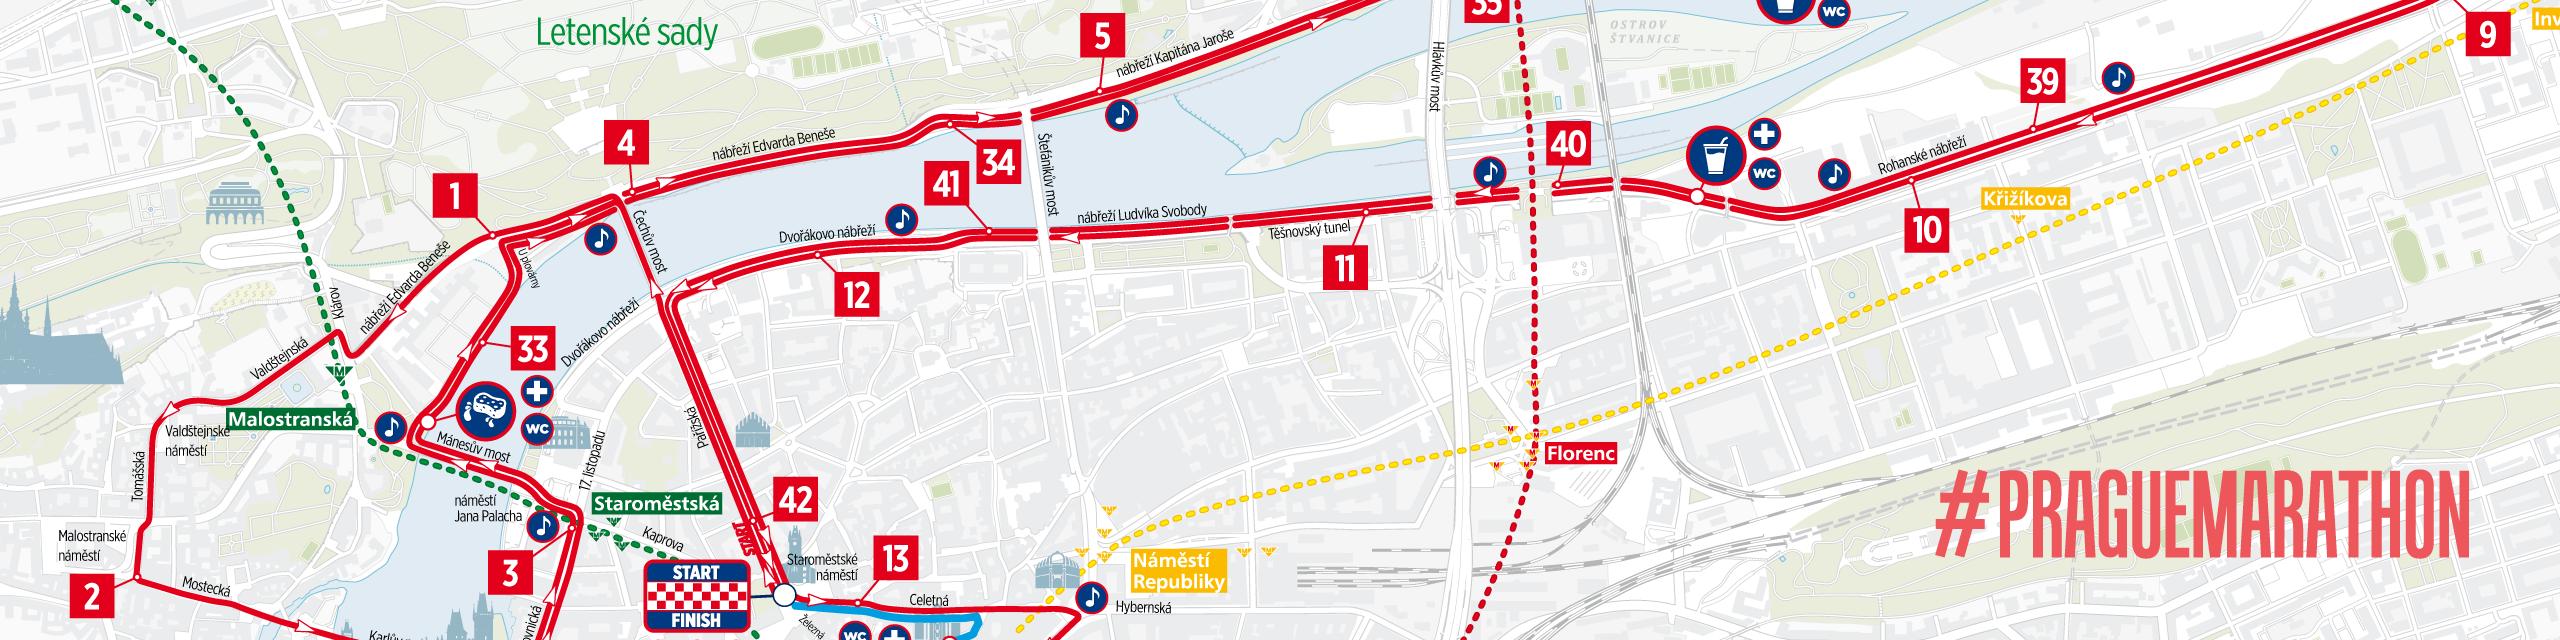 56 Great Volkswagen Prague Marathon 2020 Specs and Review with Volkswagen Prague Marathon 2020